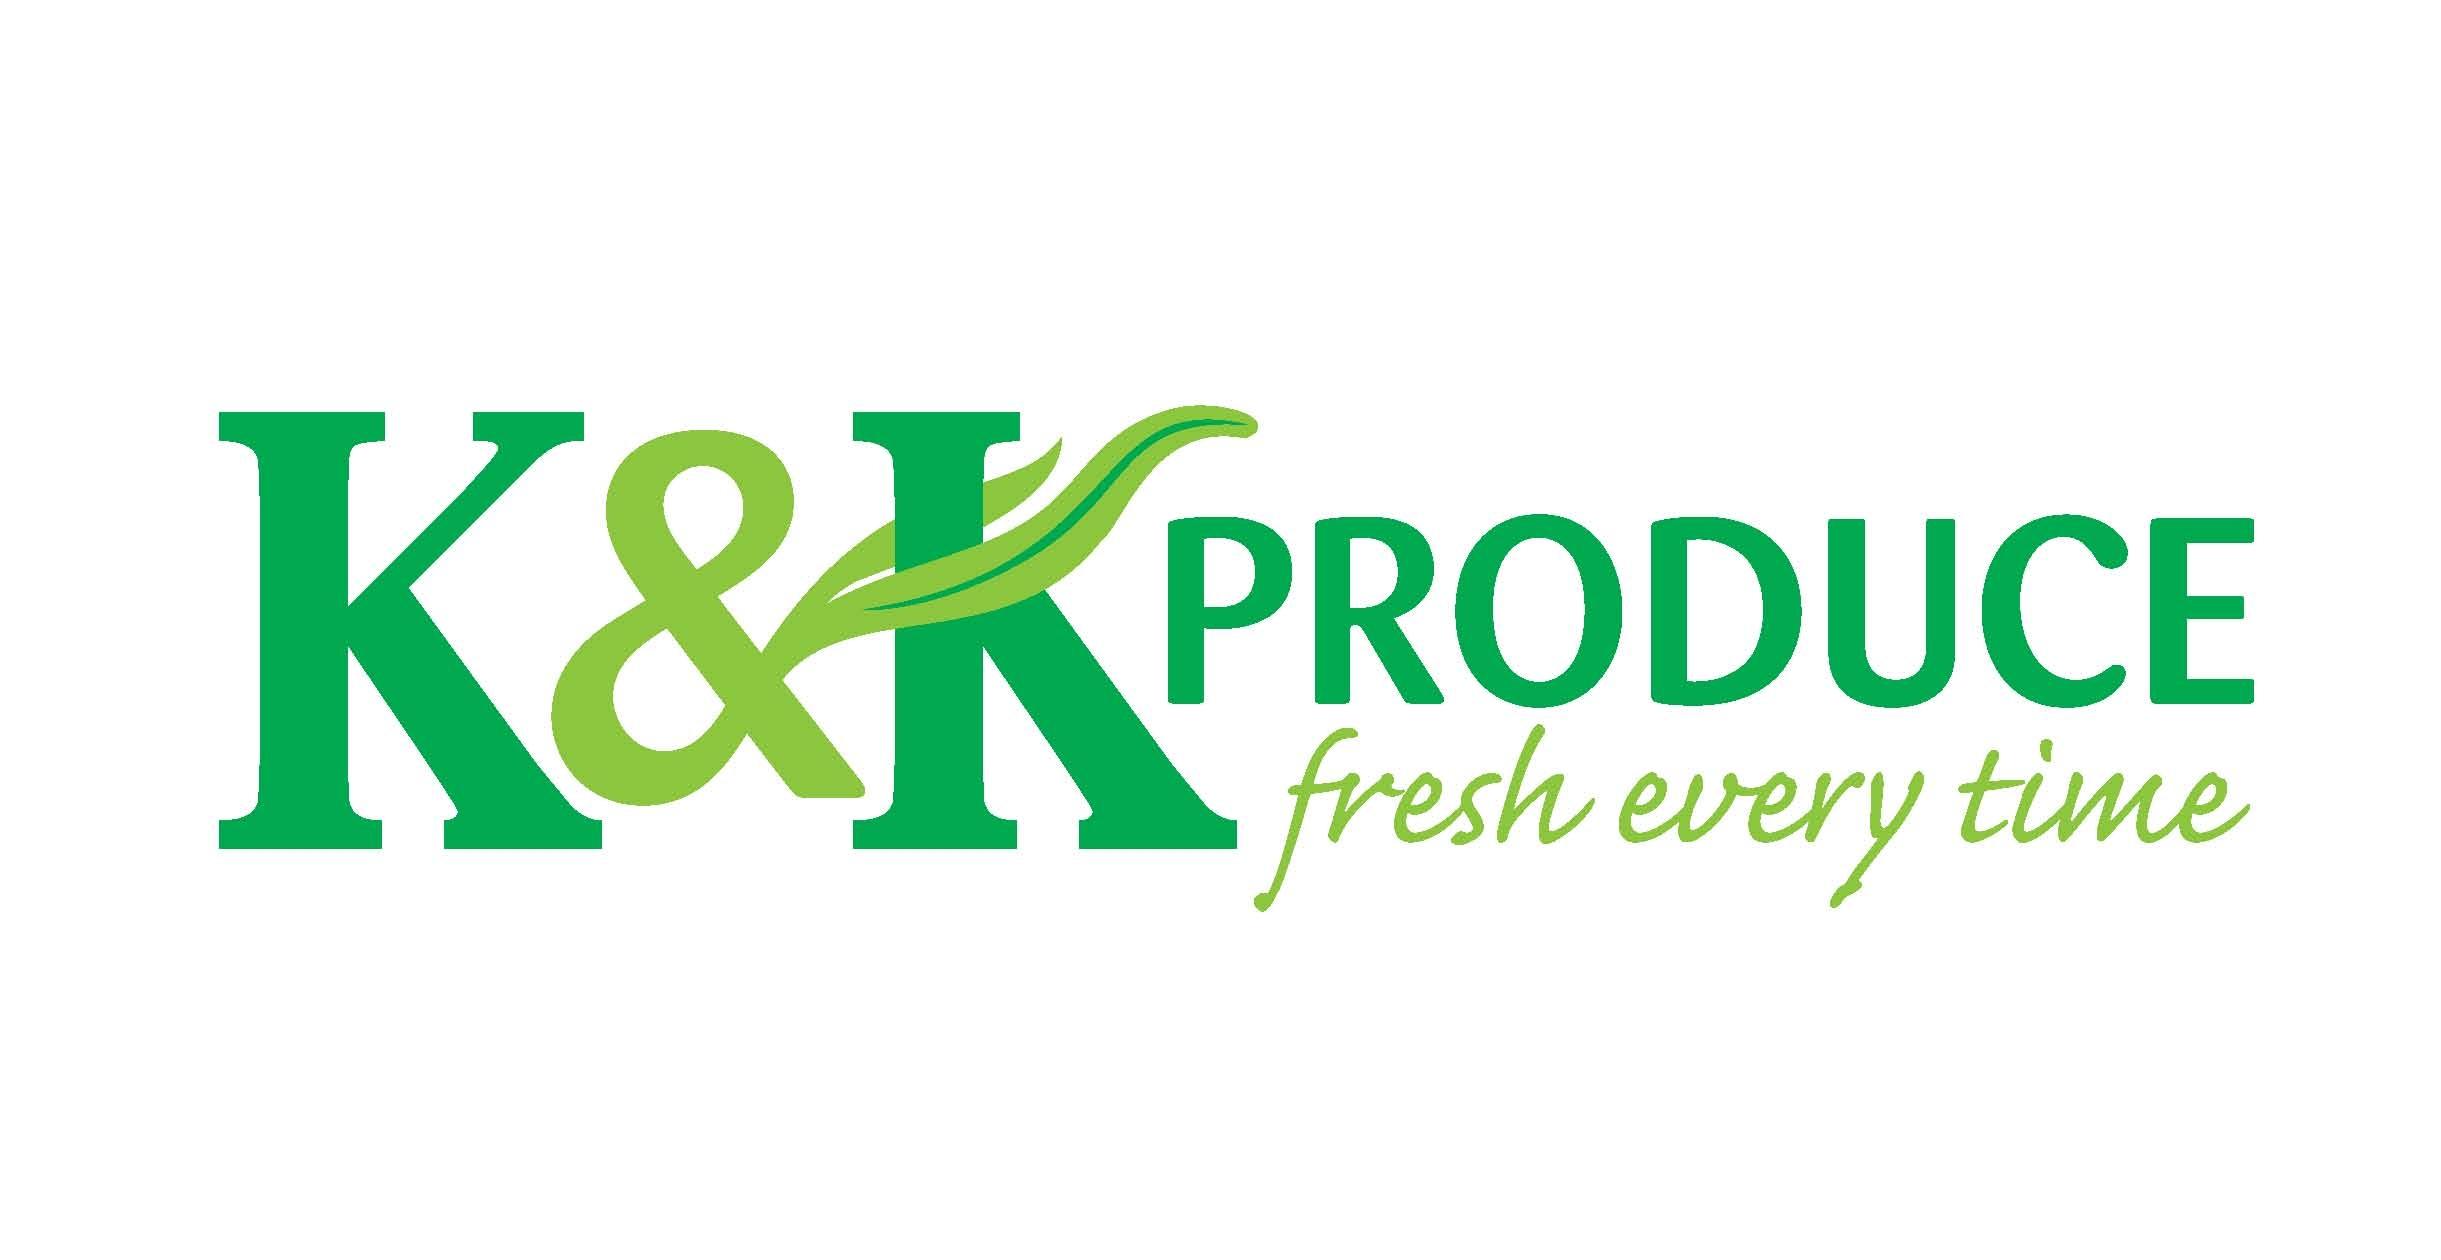 K & K Produce logotype